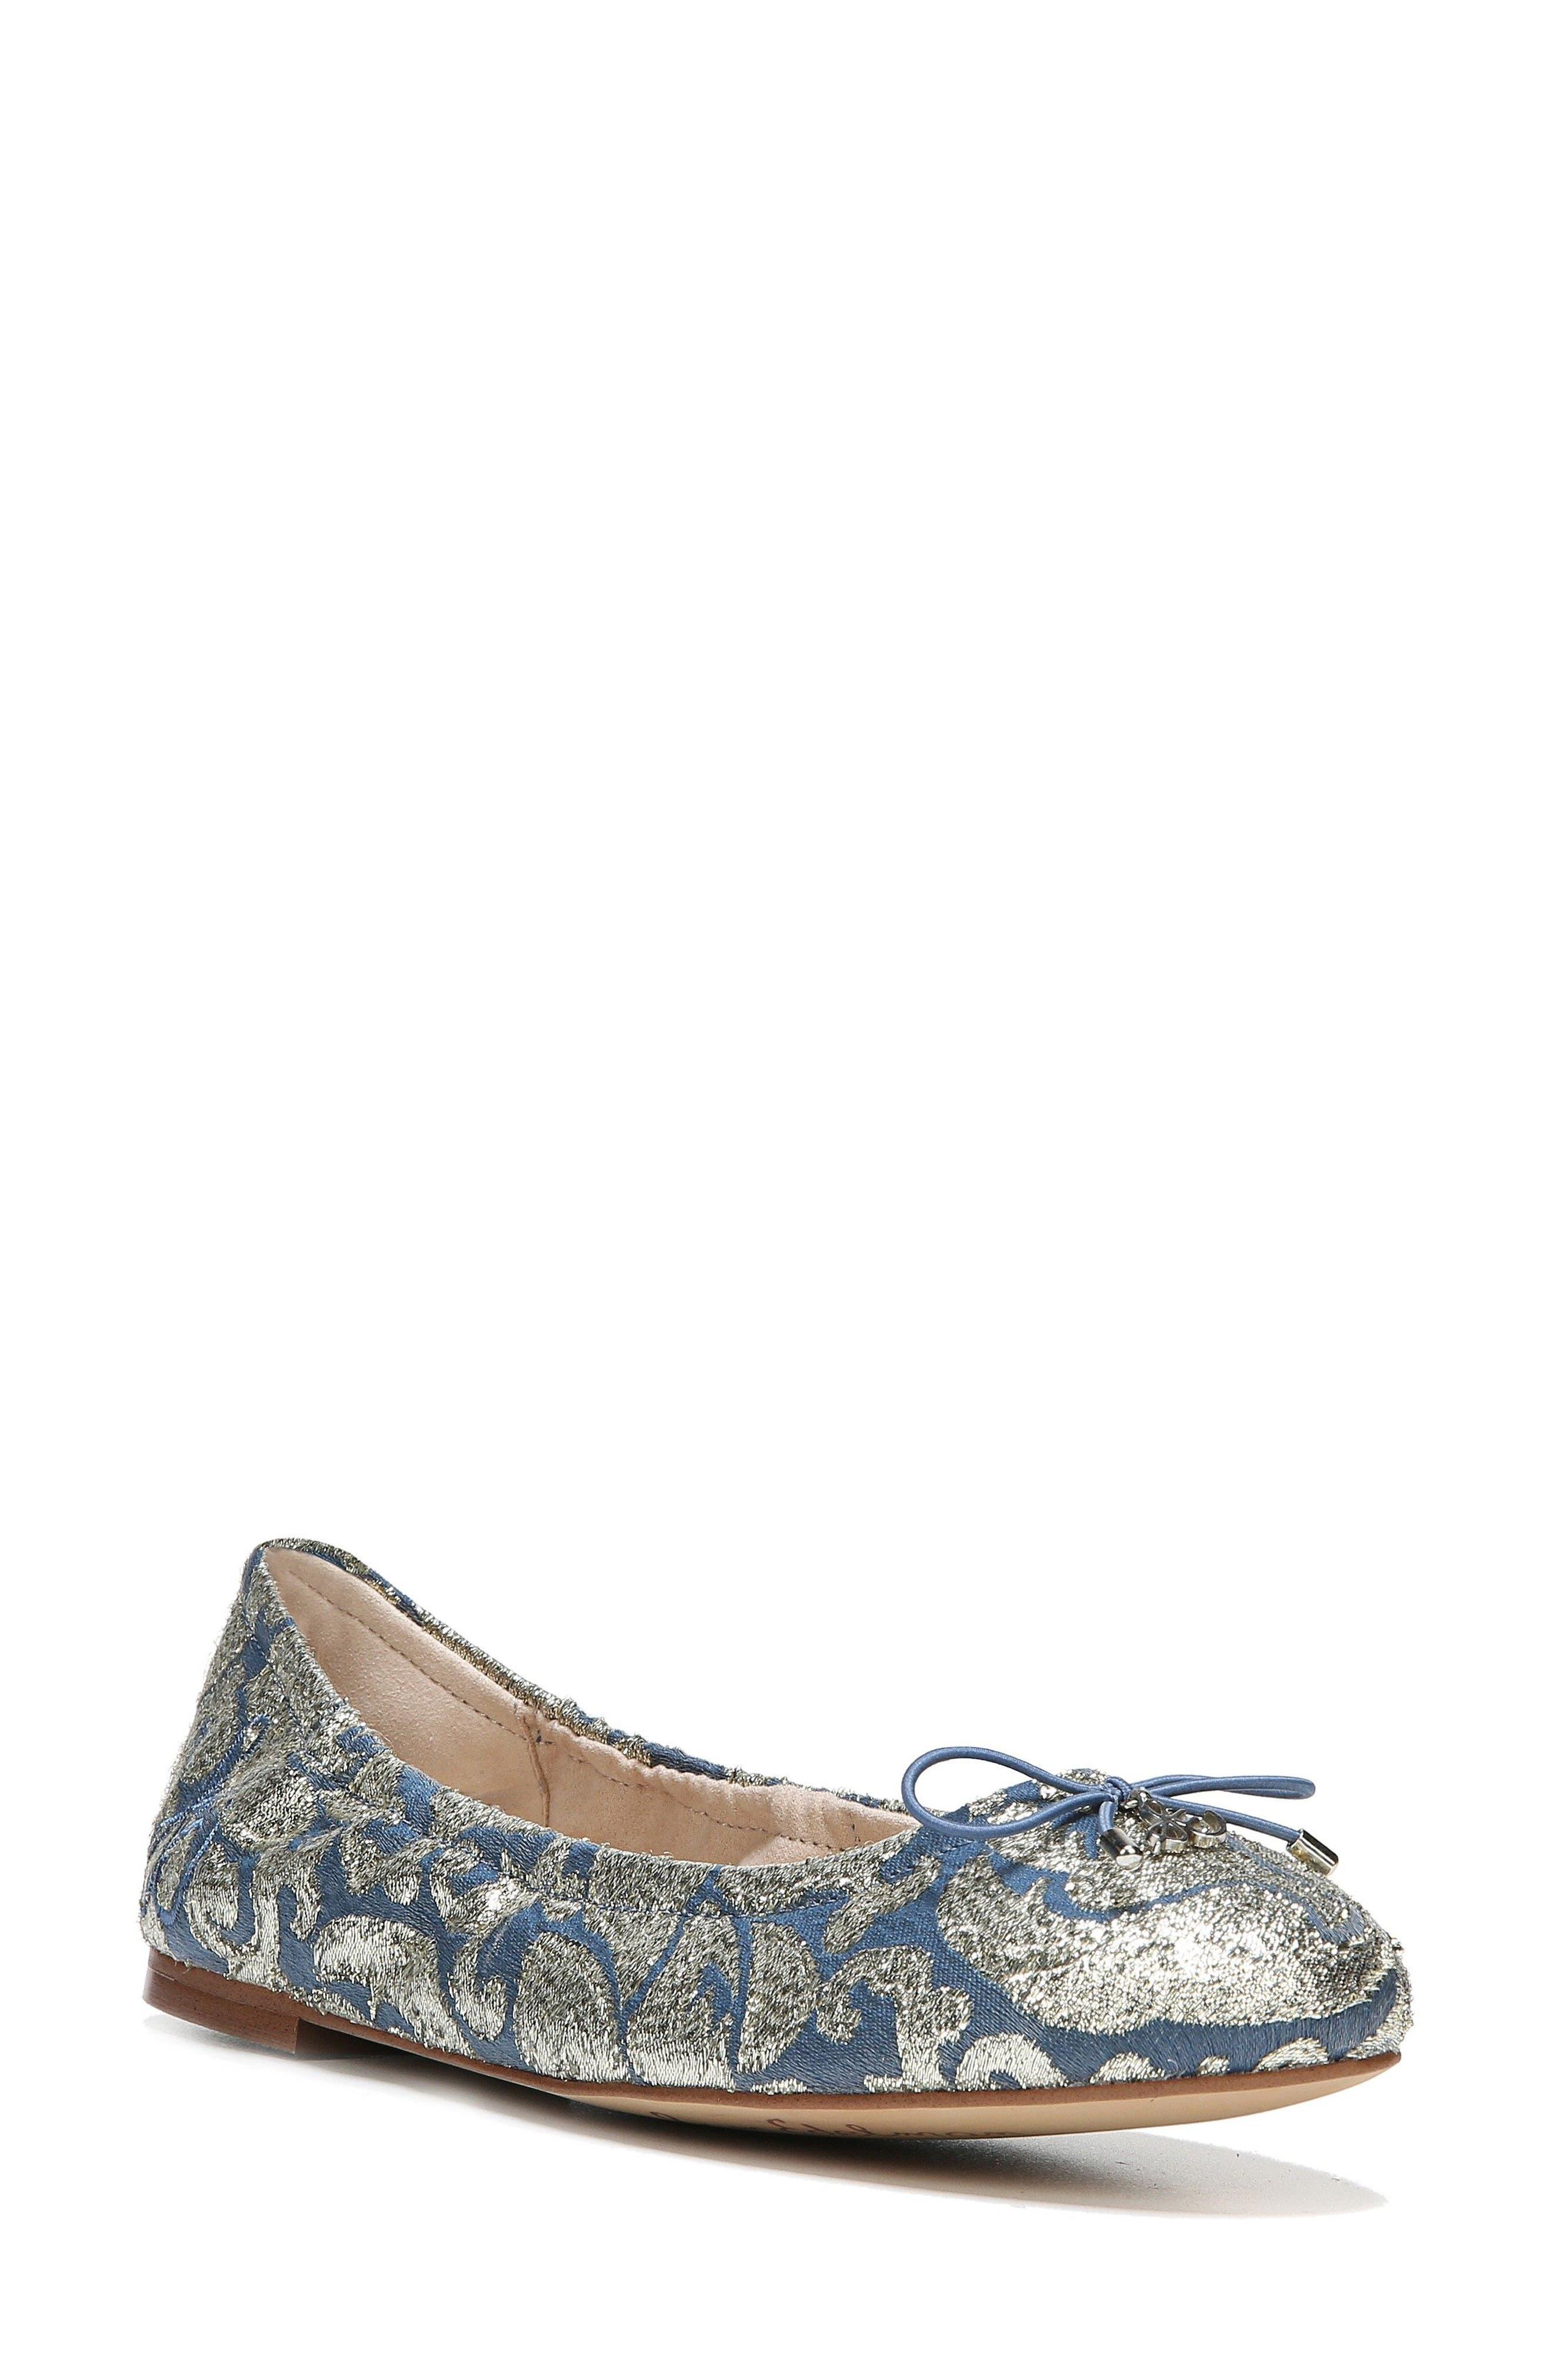 Felicia Flat,                         Main,                         color, BLUE MULTI CANVAS